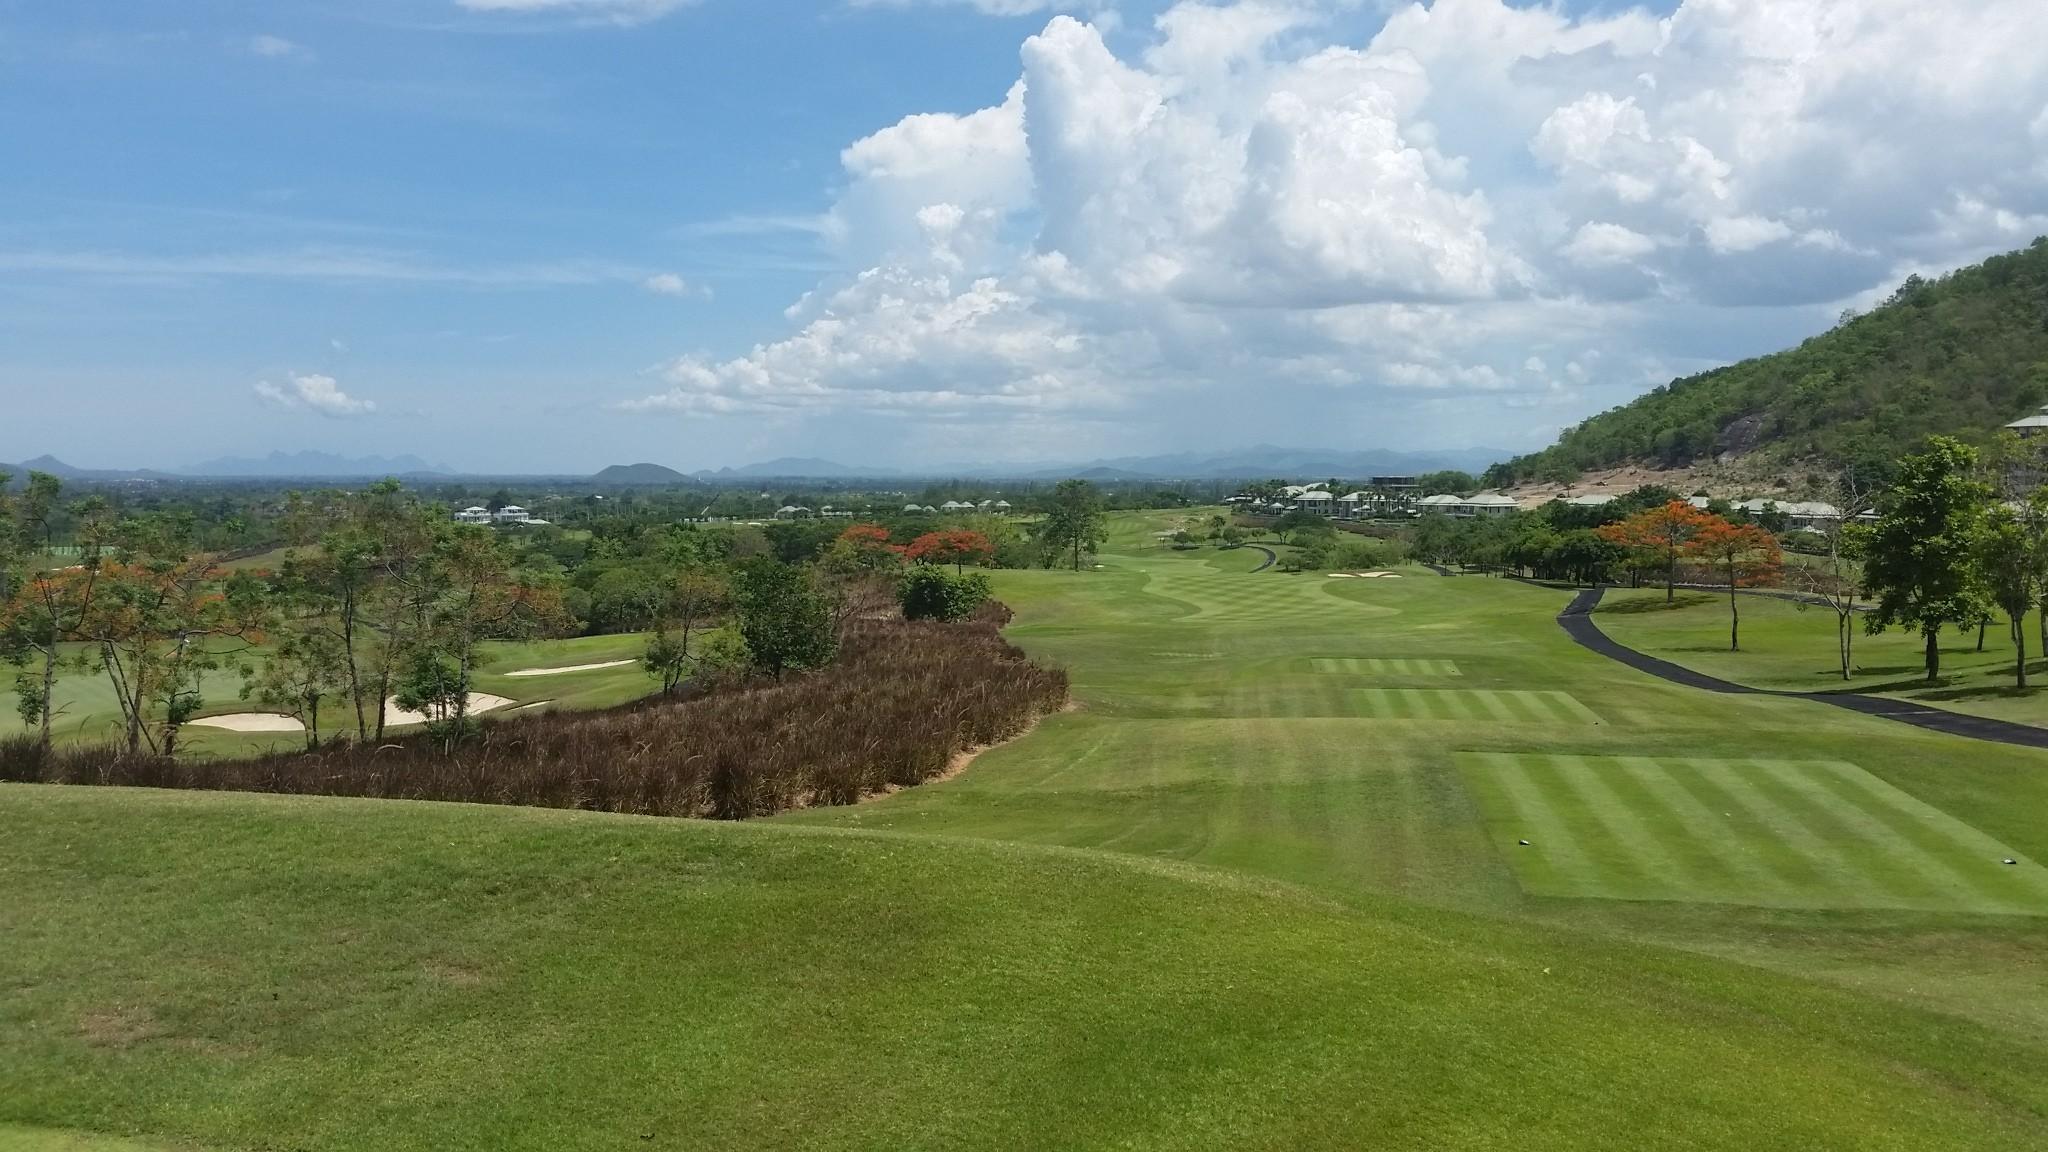 Tajlandia ? Raj golfisty